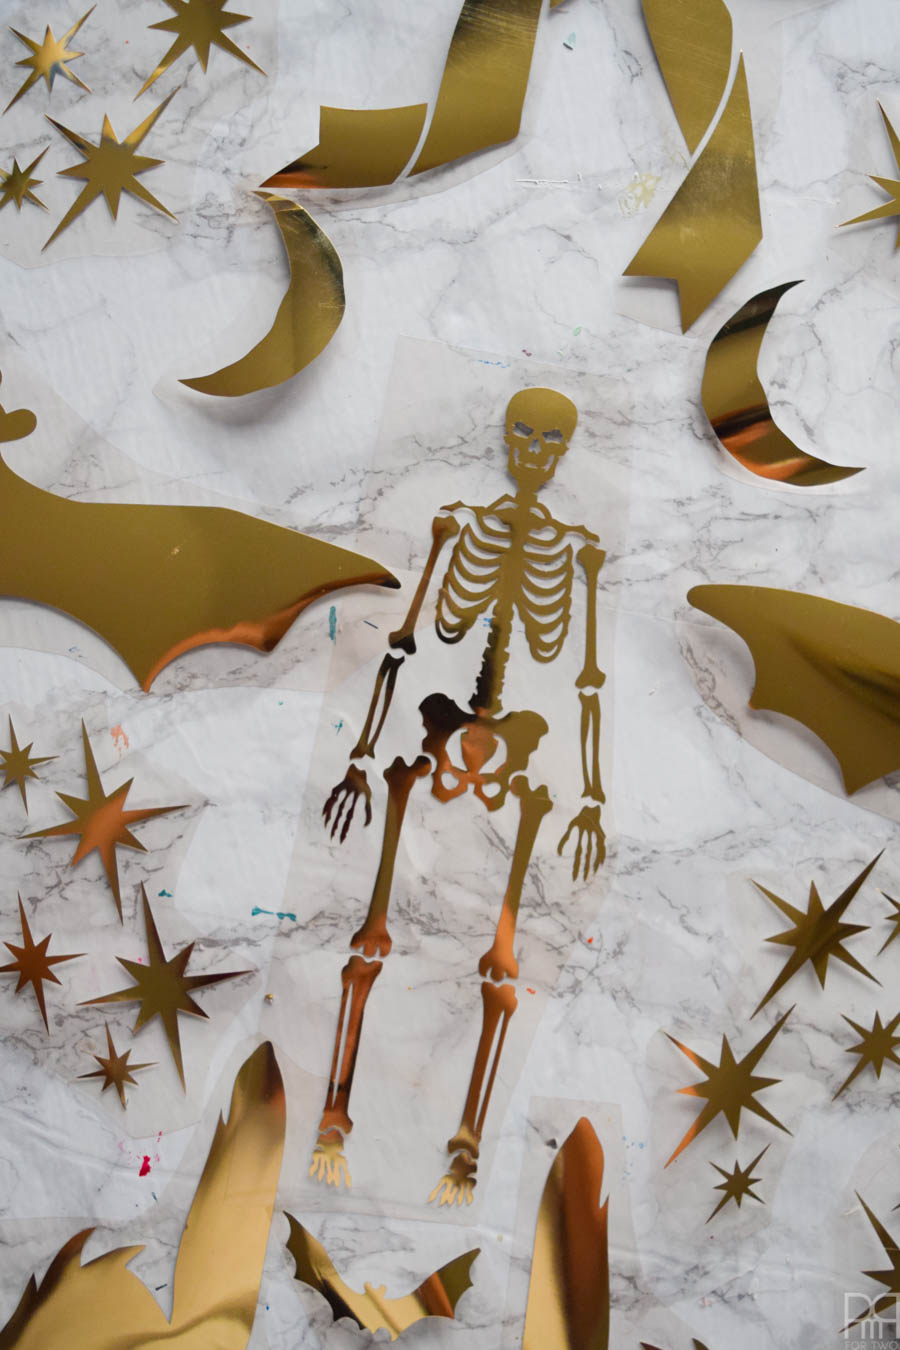 skeleton, bat and atomic starbursts cut from gold HTV